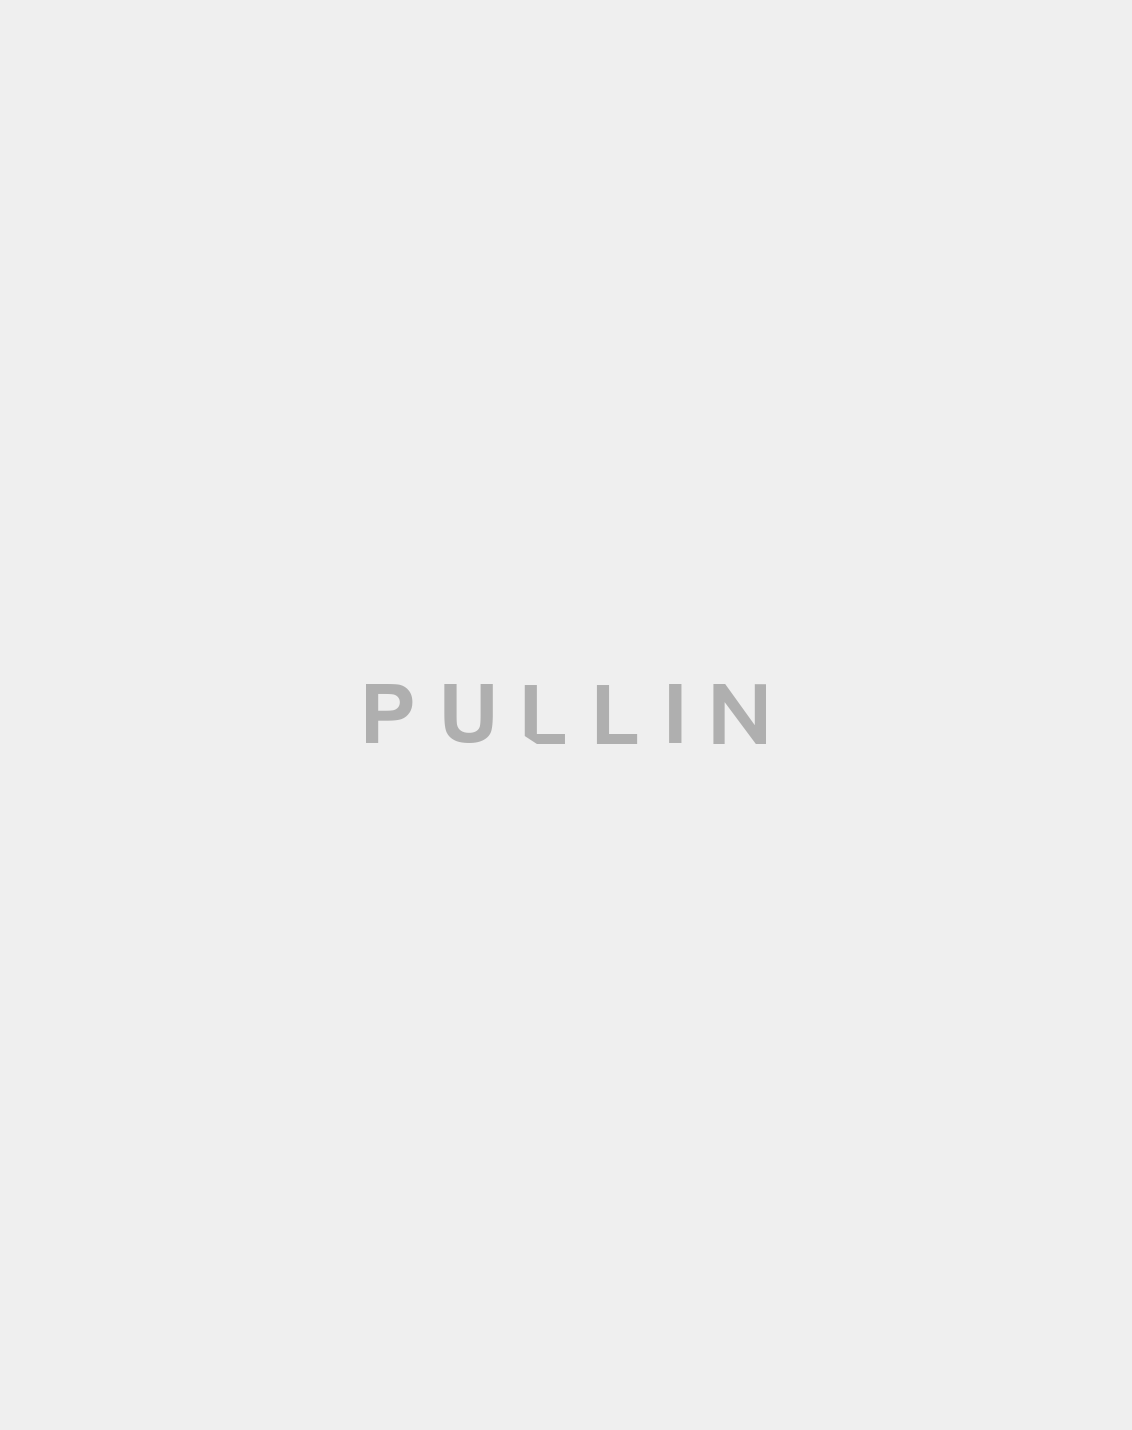 T-shirt cornelius homme - pull in 2